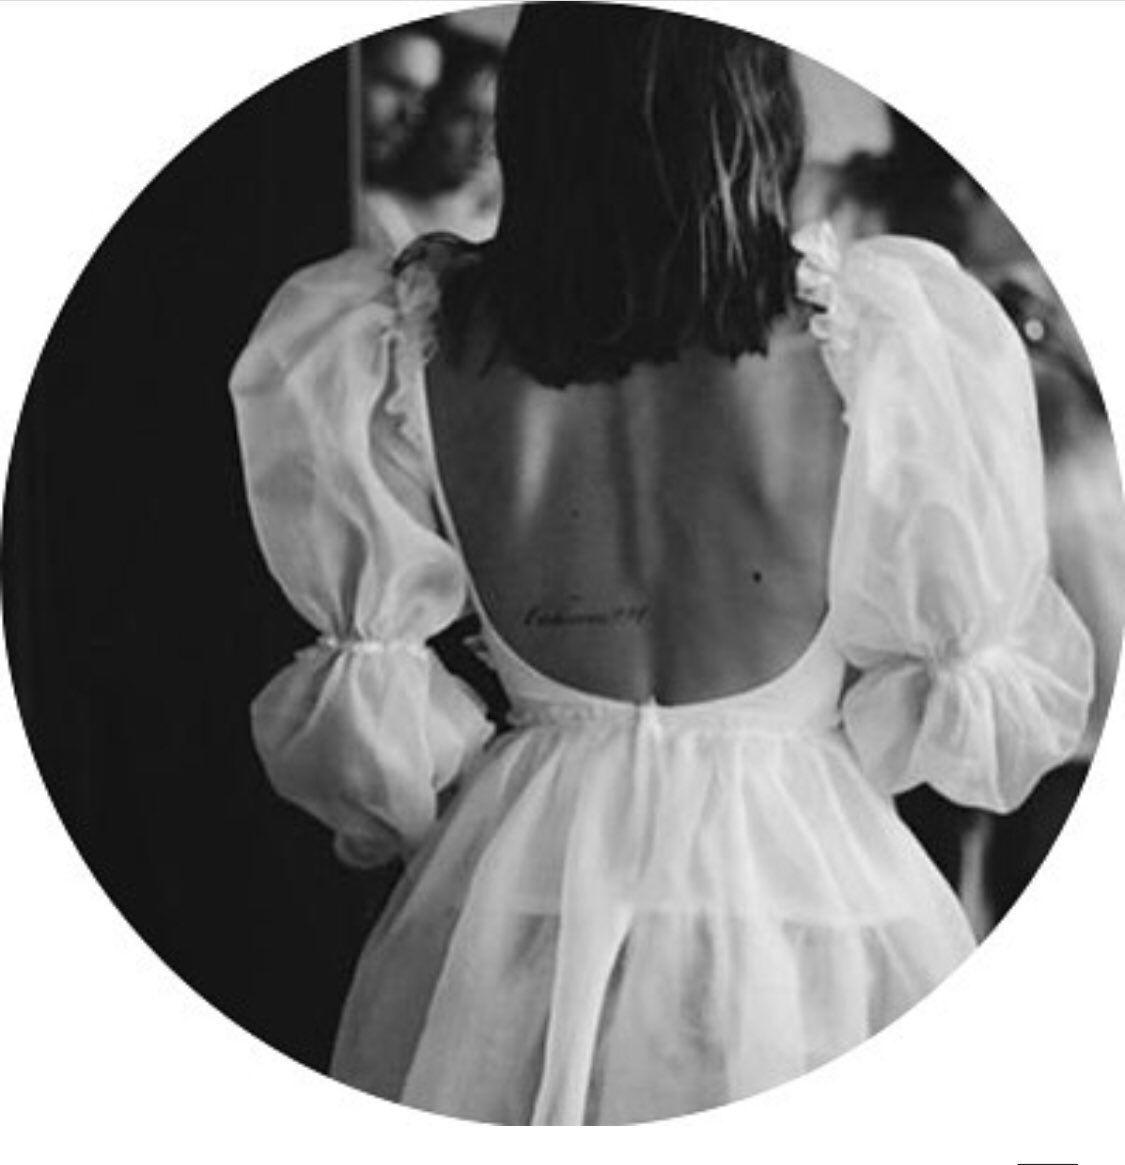 Pin By Amalottb On Girls Bad Girl Aesthetic Girly Images Photo Ideas Girl